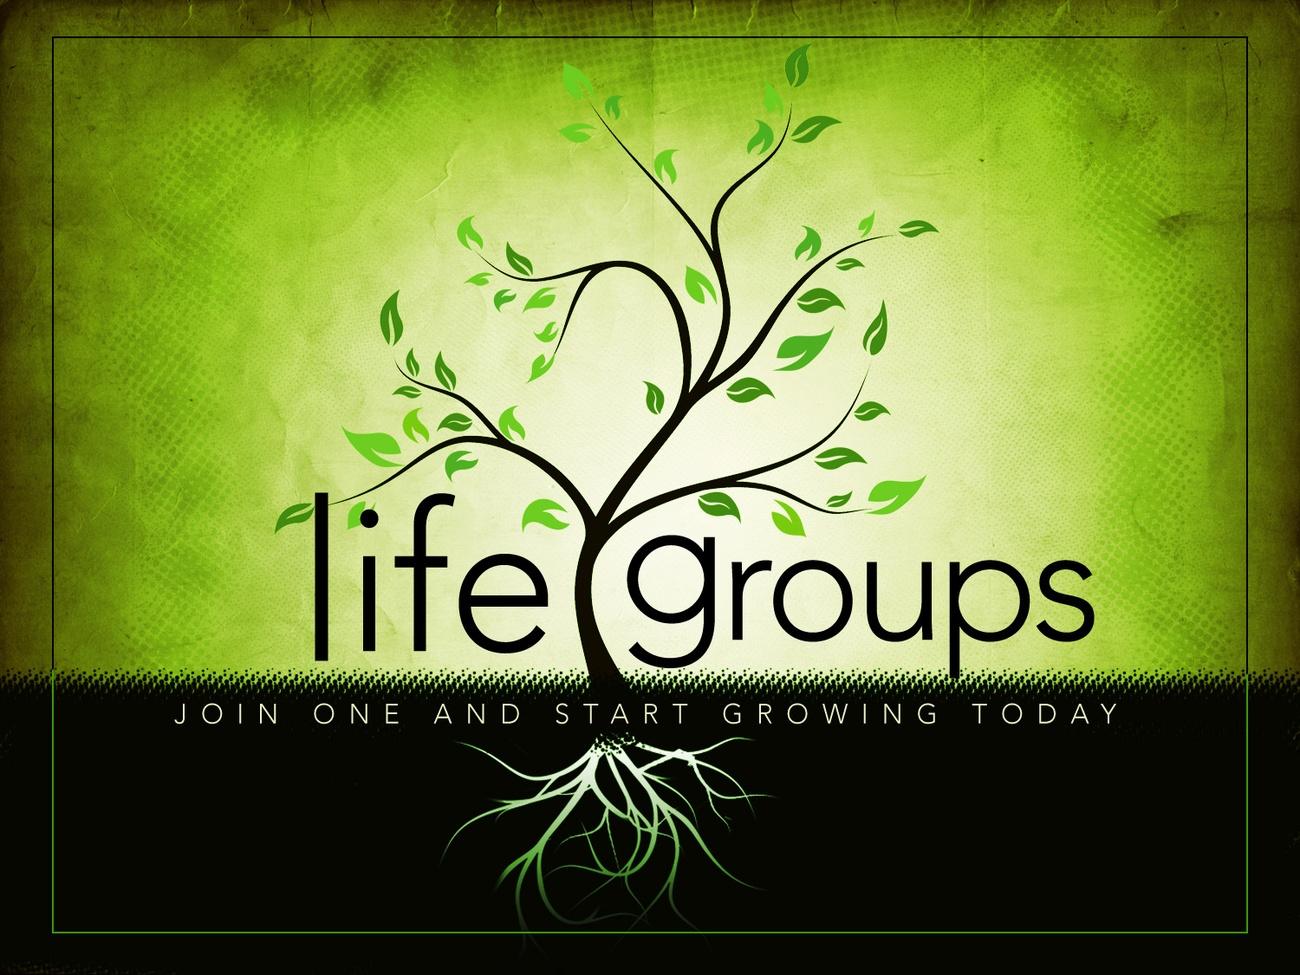 Life groups pp slide original